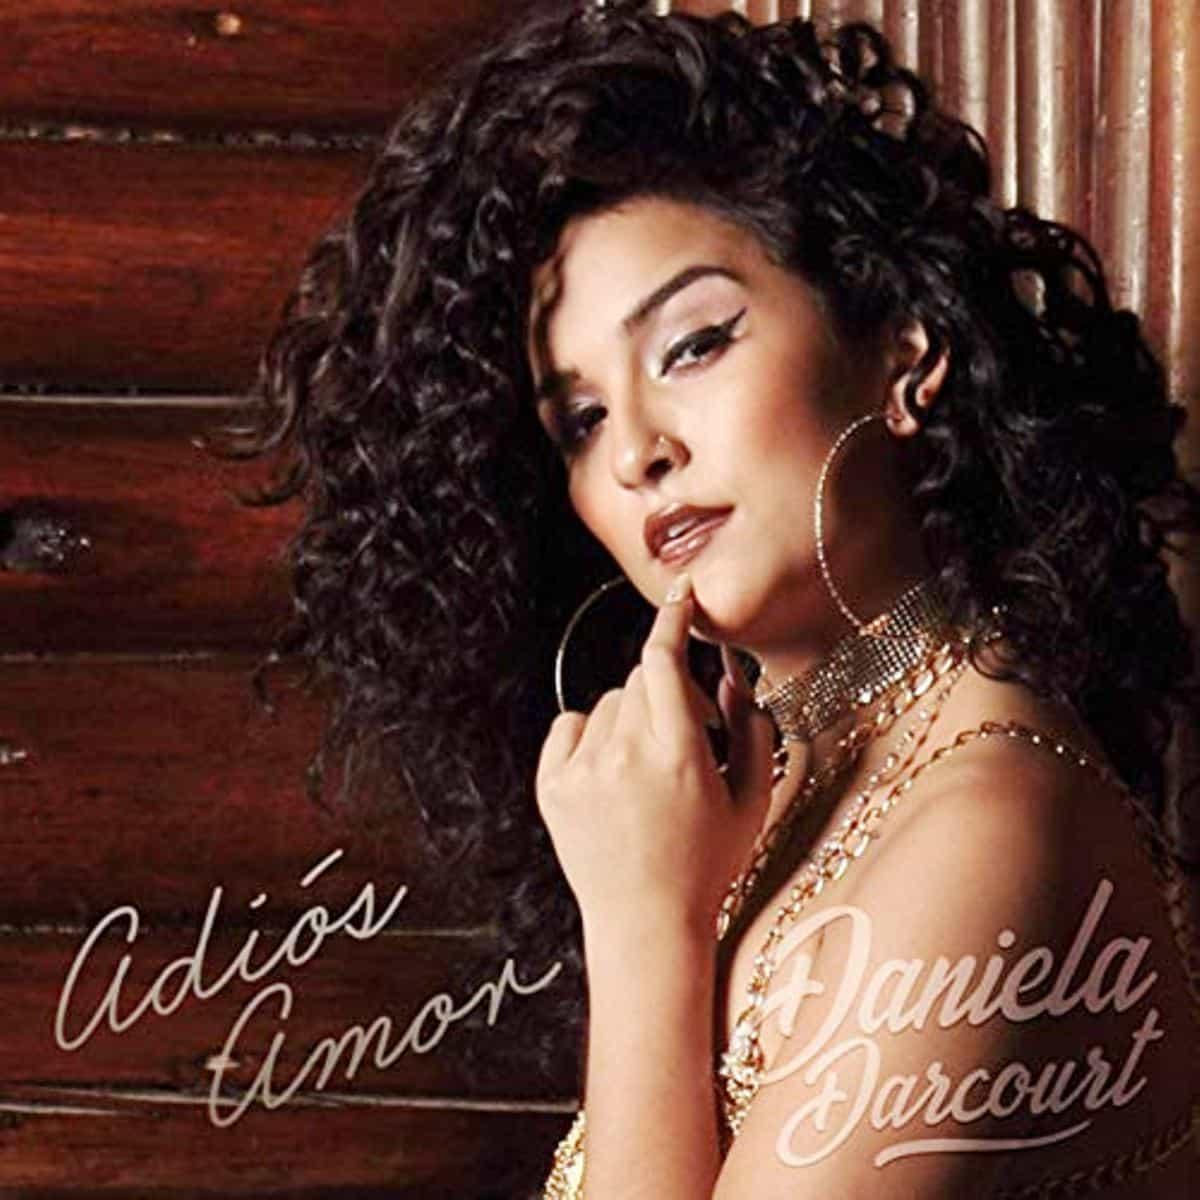 Salsa-Musik von Daniela Darcourt Album Adios Amor